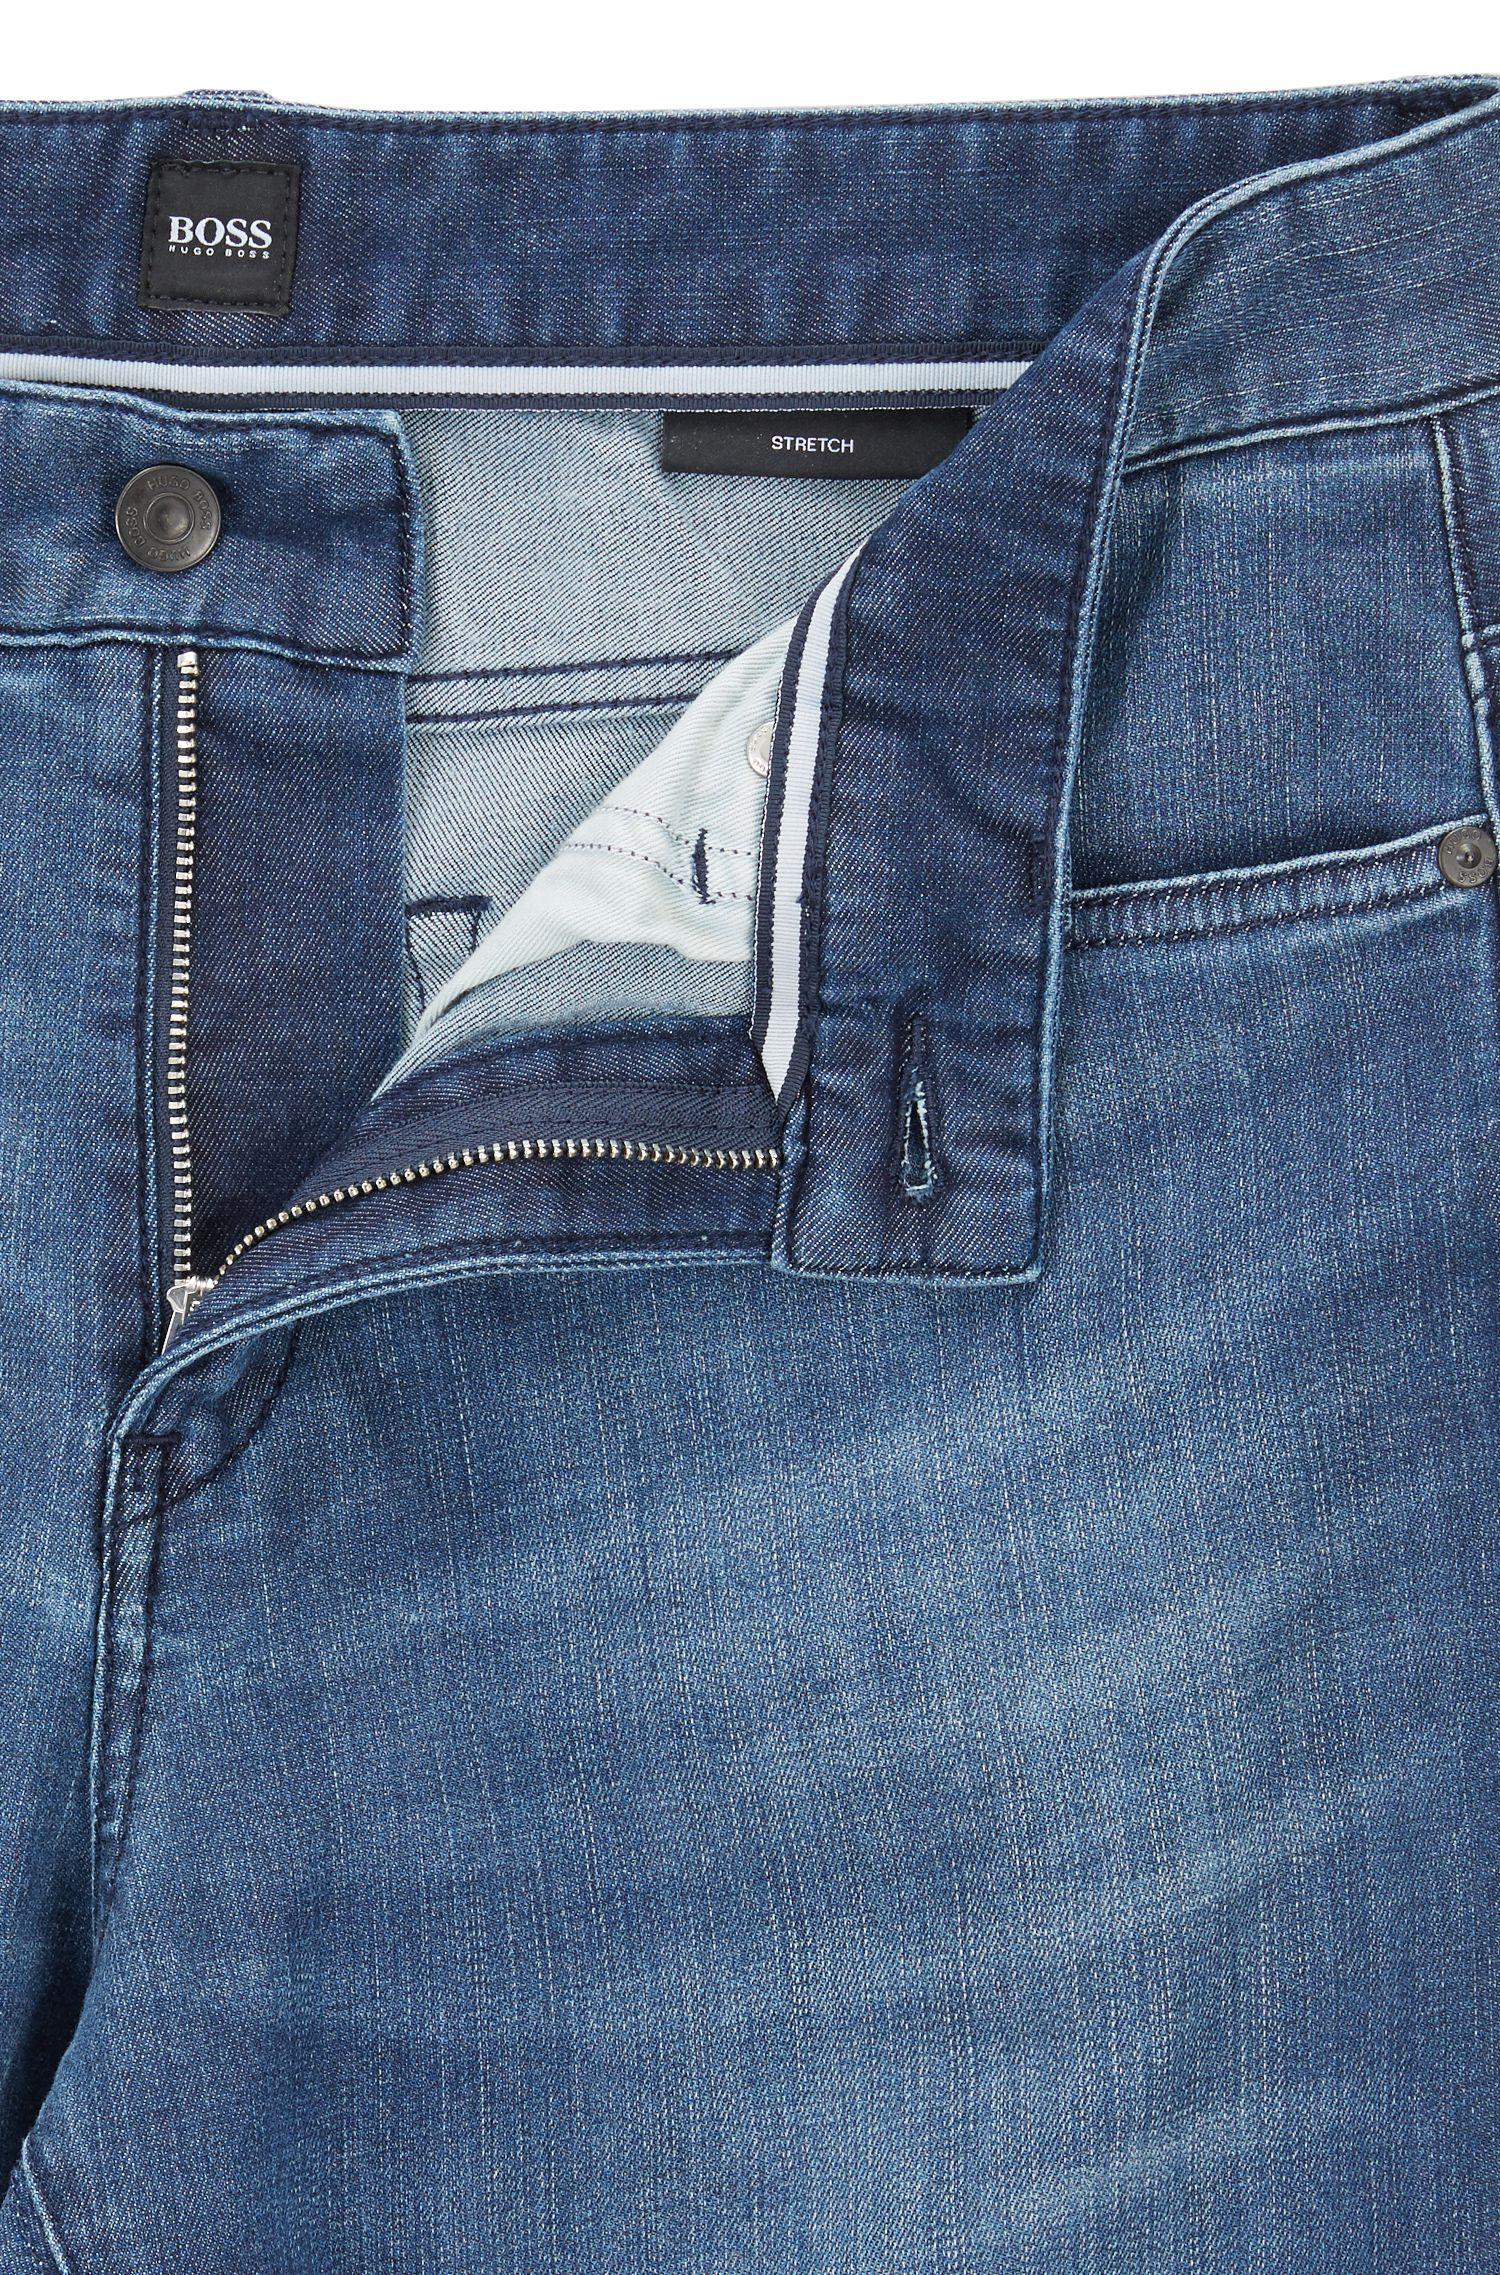 Middelblauwe slim-fit jeans van stretchdenim